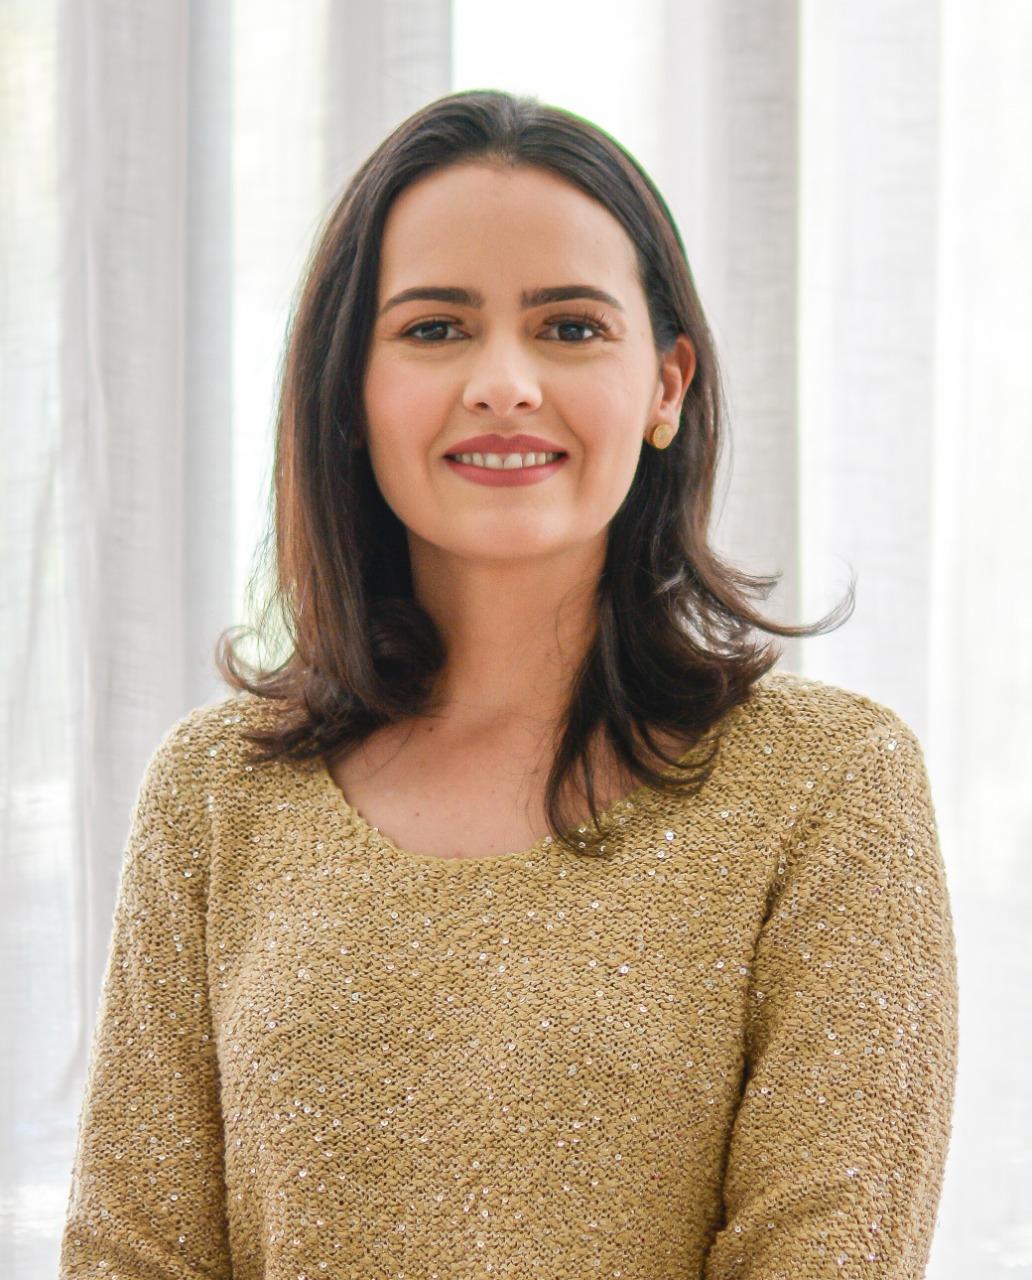 Rafaella Lima